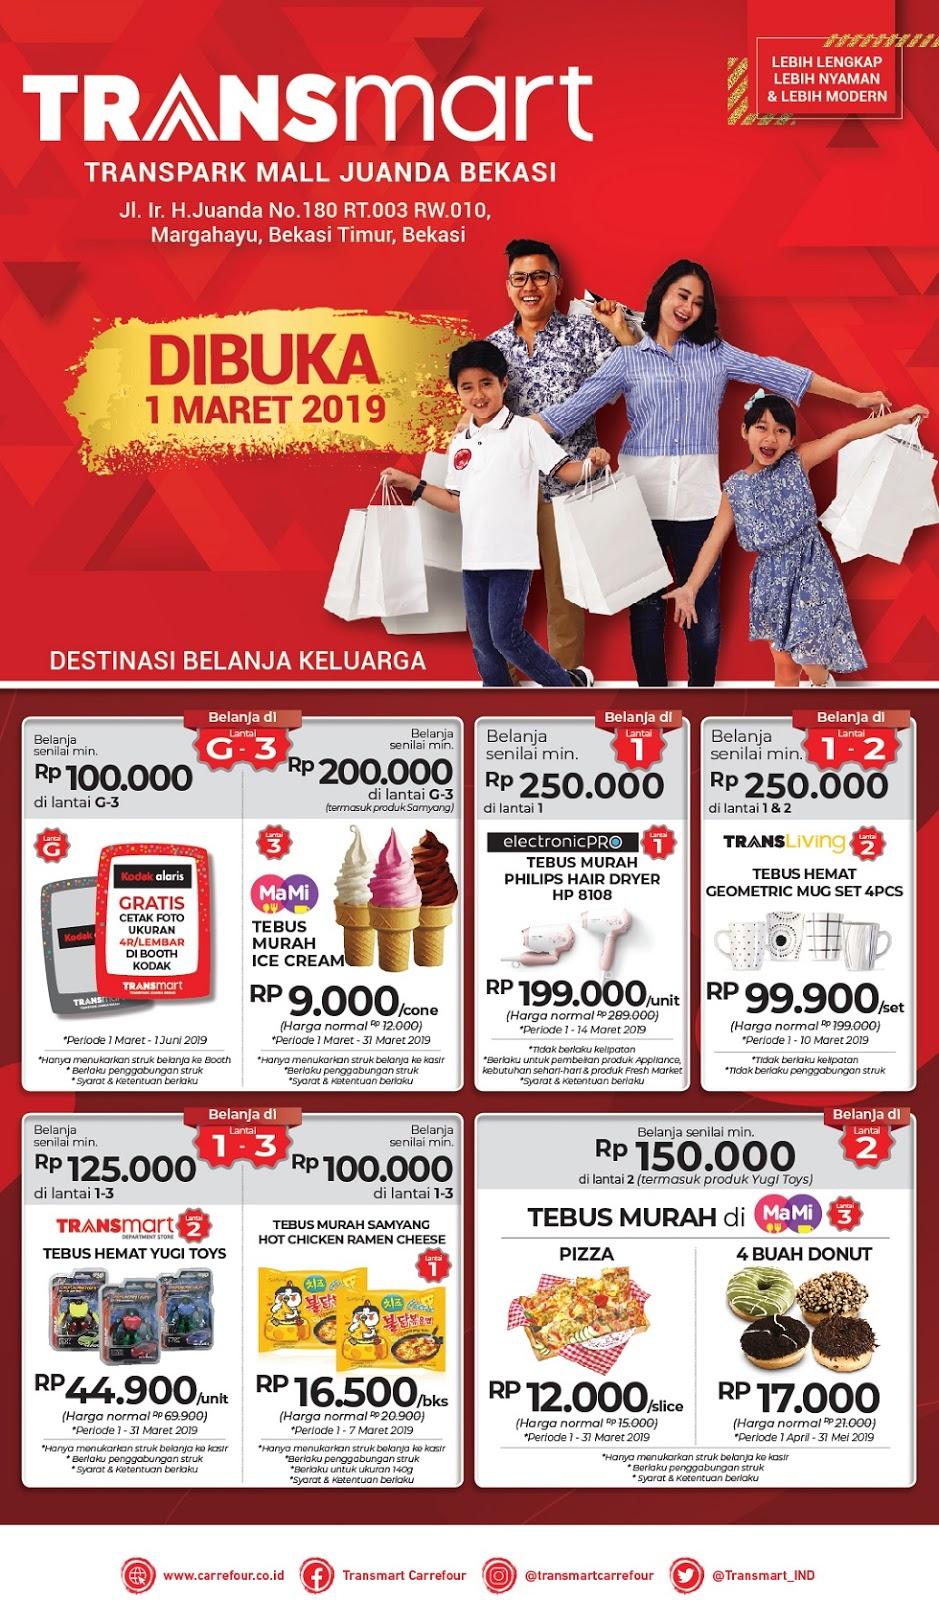 #Transmart #Carrefour - #Promo Opening Transpark Mall Juanda Bekasi (s.d 03 Maret 2019)